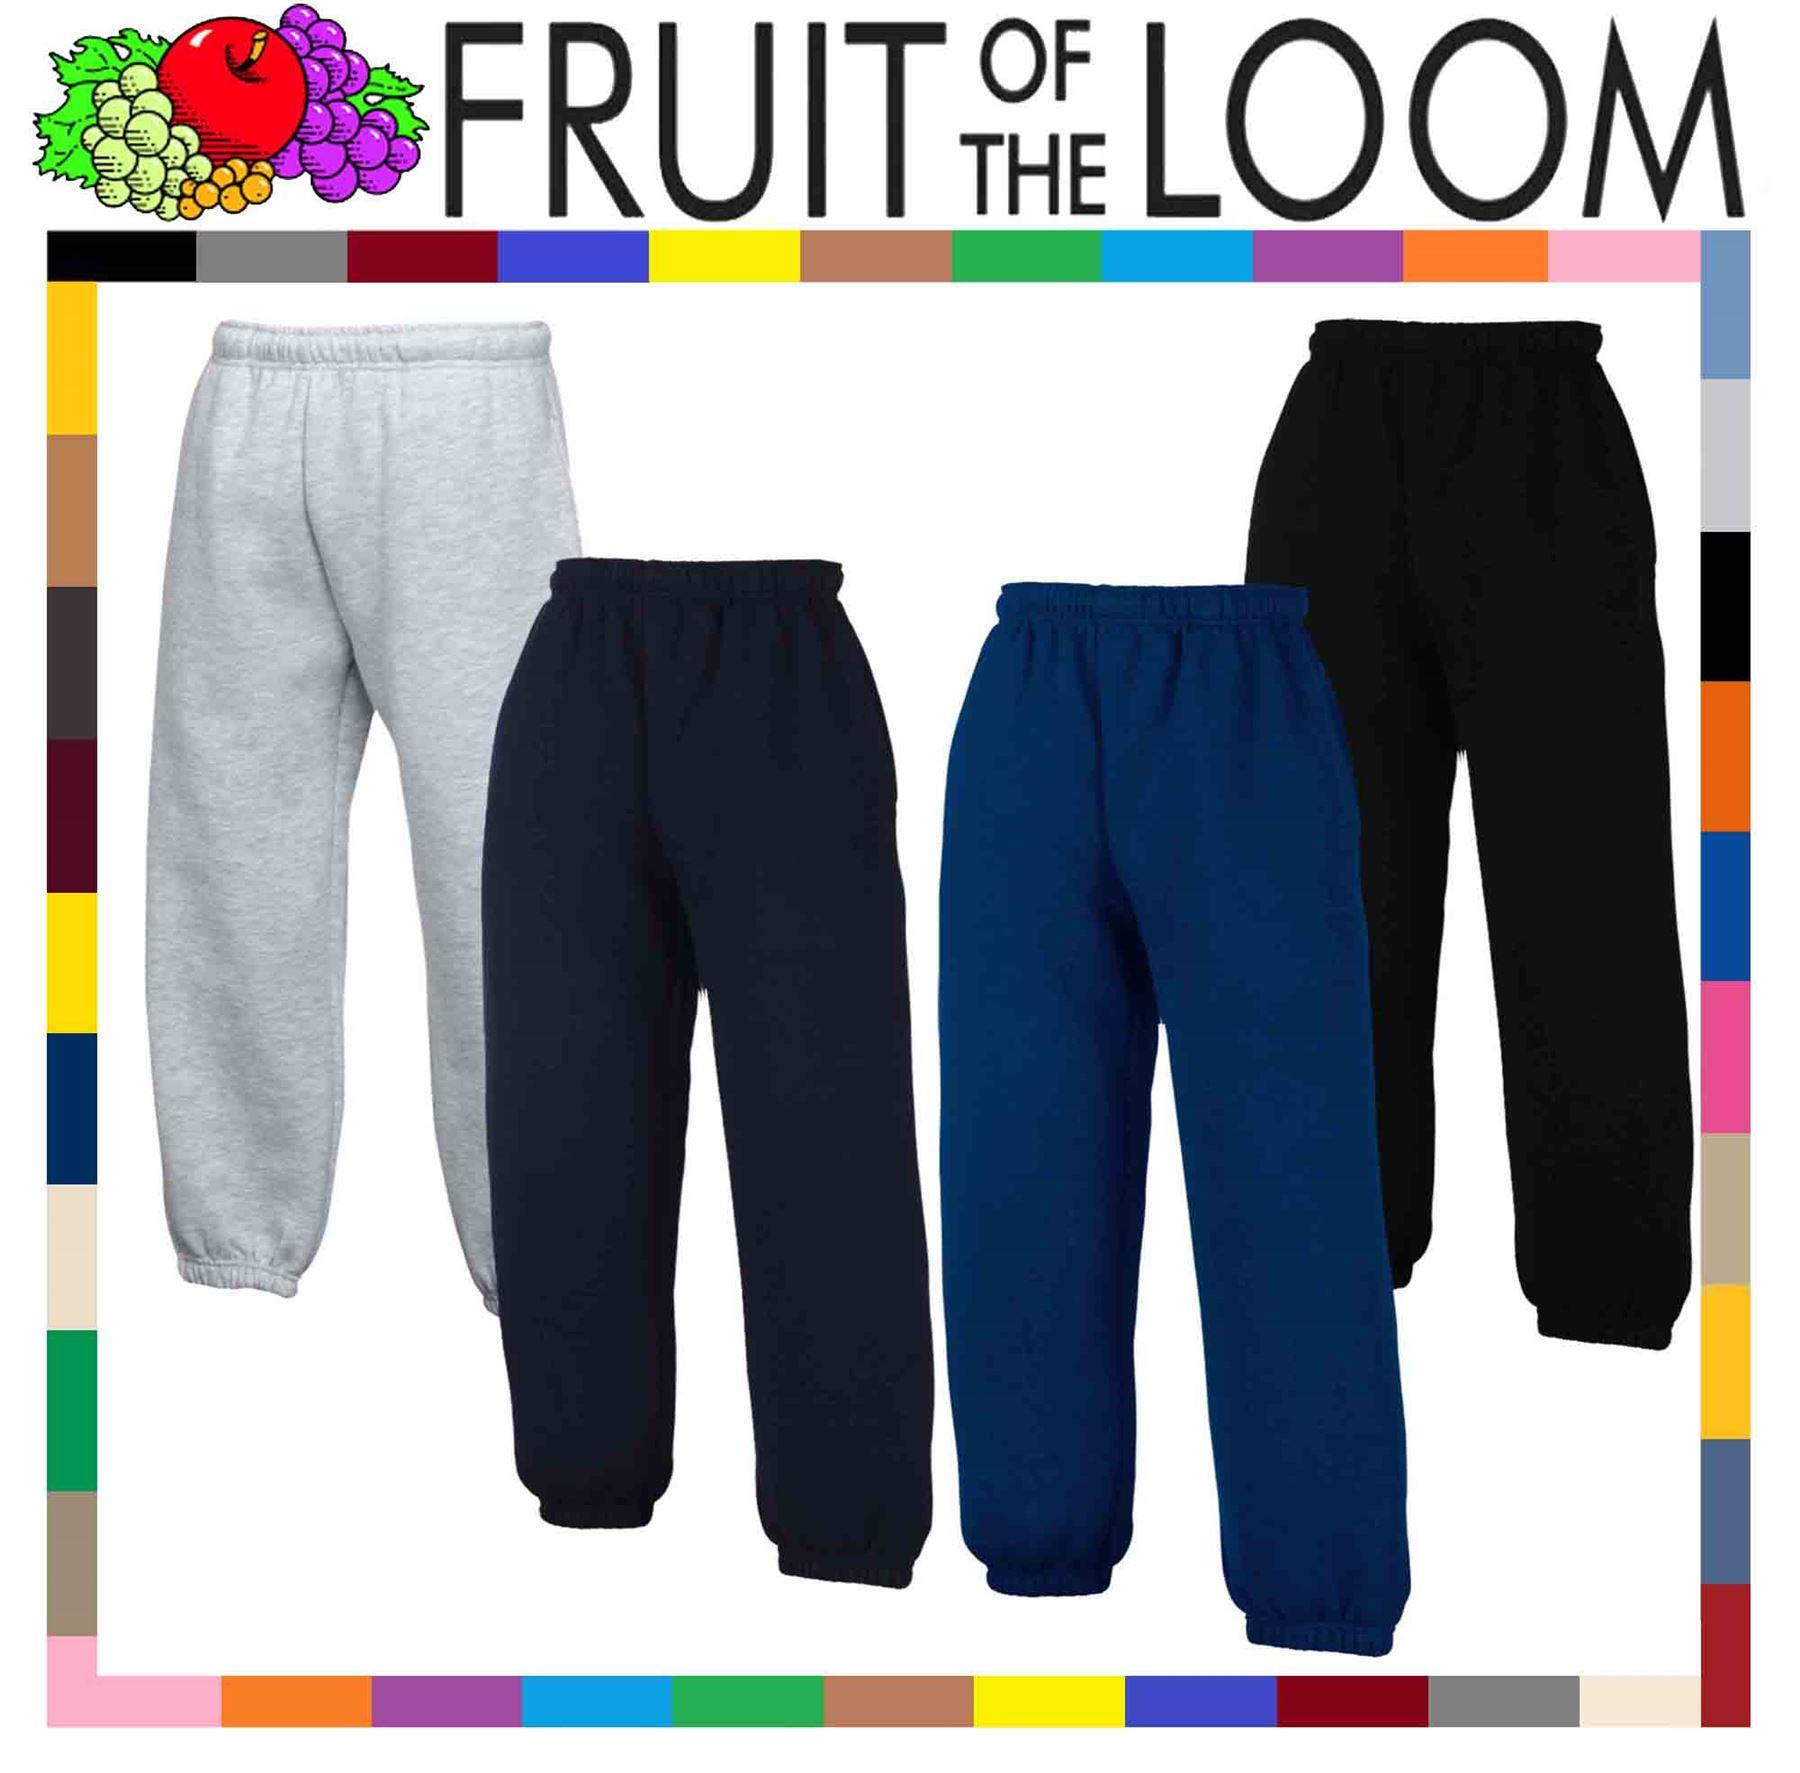 Fruit of the Loom Unisex Kids Performance Shorts